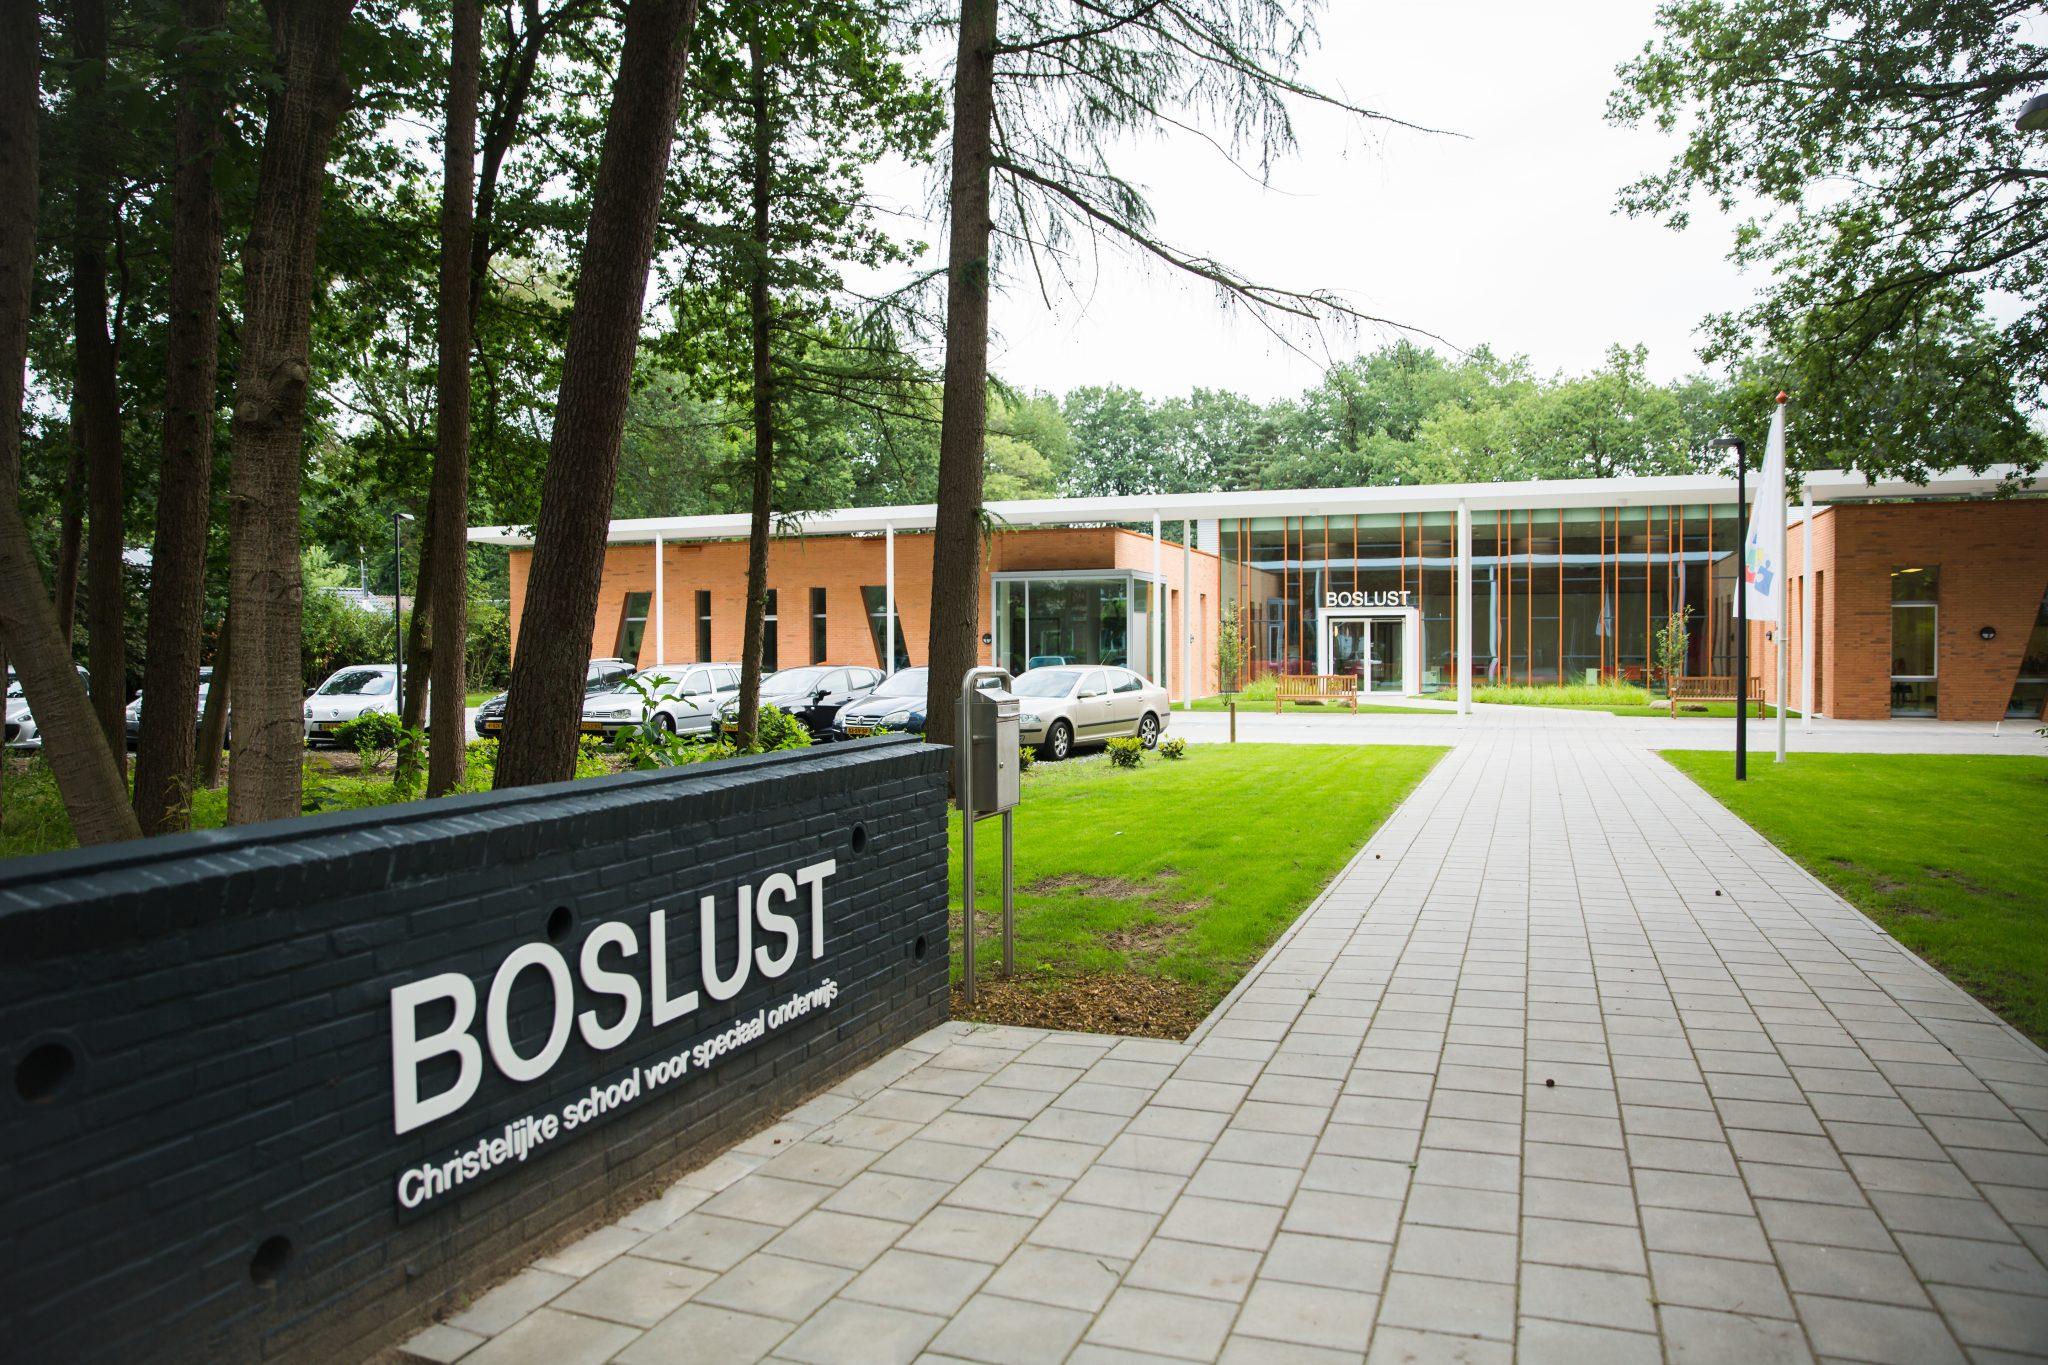 De Boslust school te Ommen